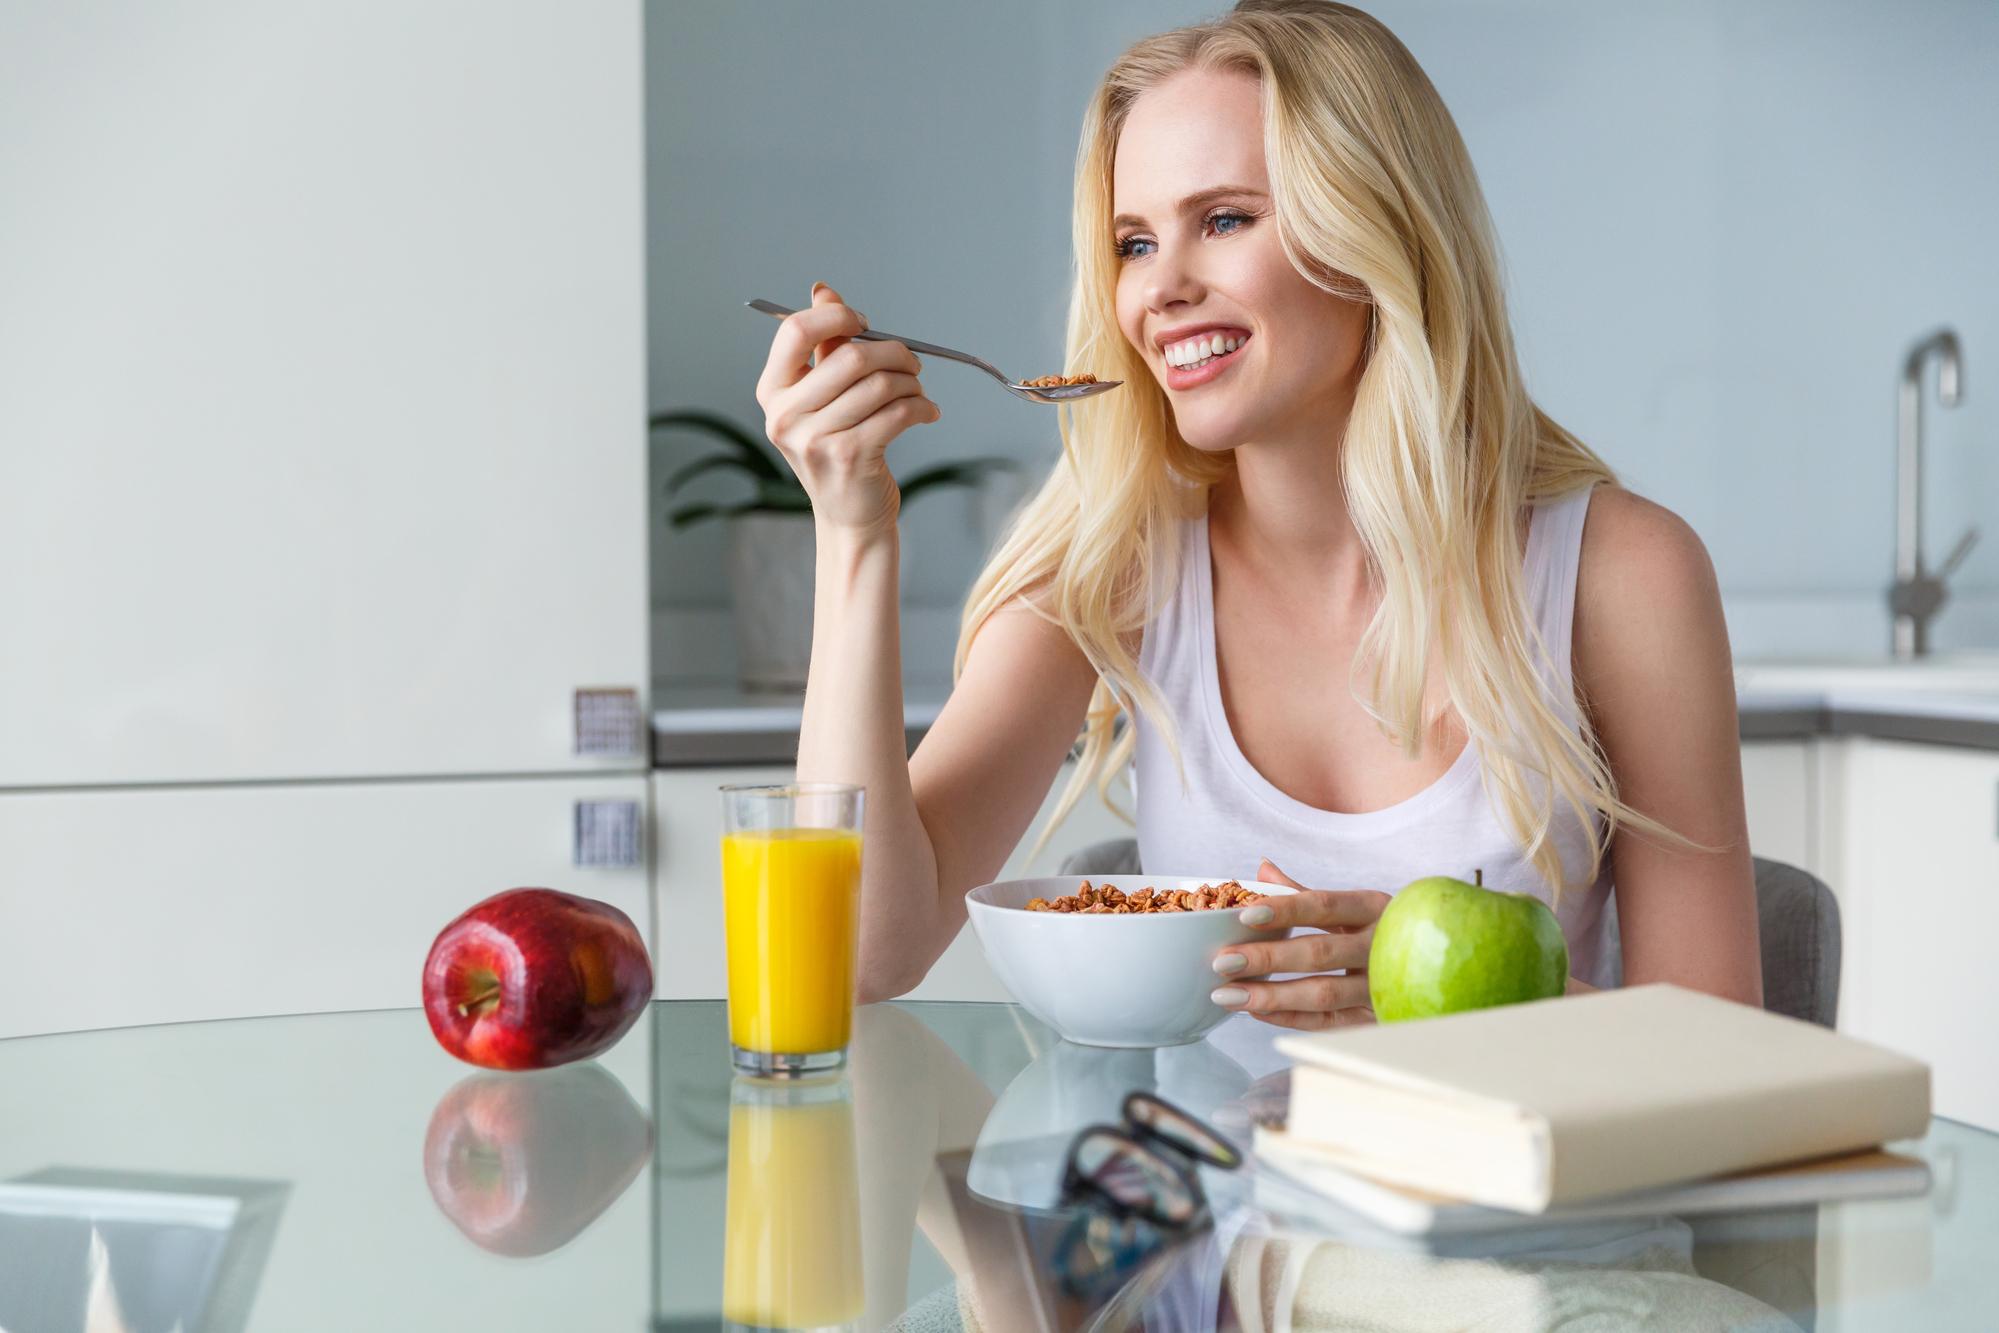 Шейпинг для похудения в домашних условиях видео уроки